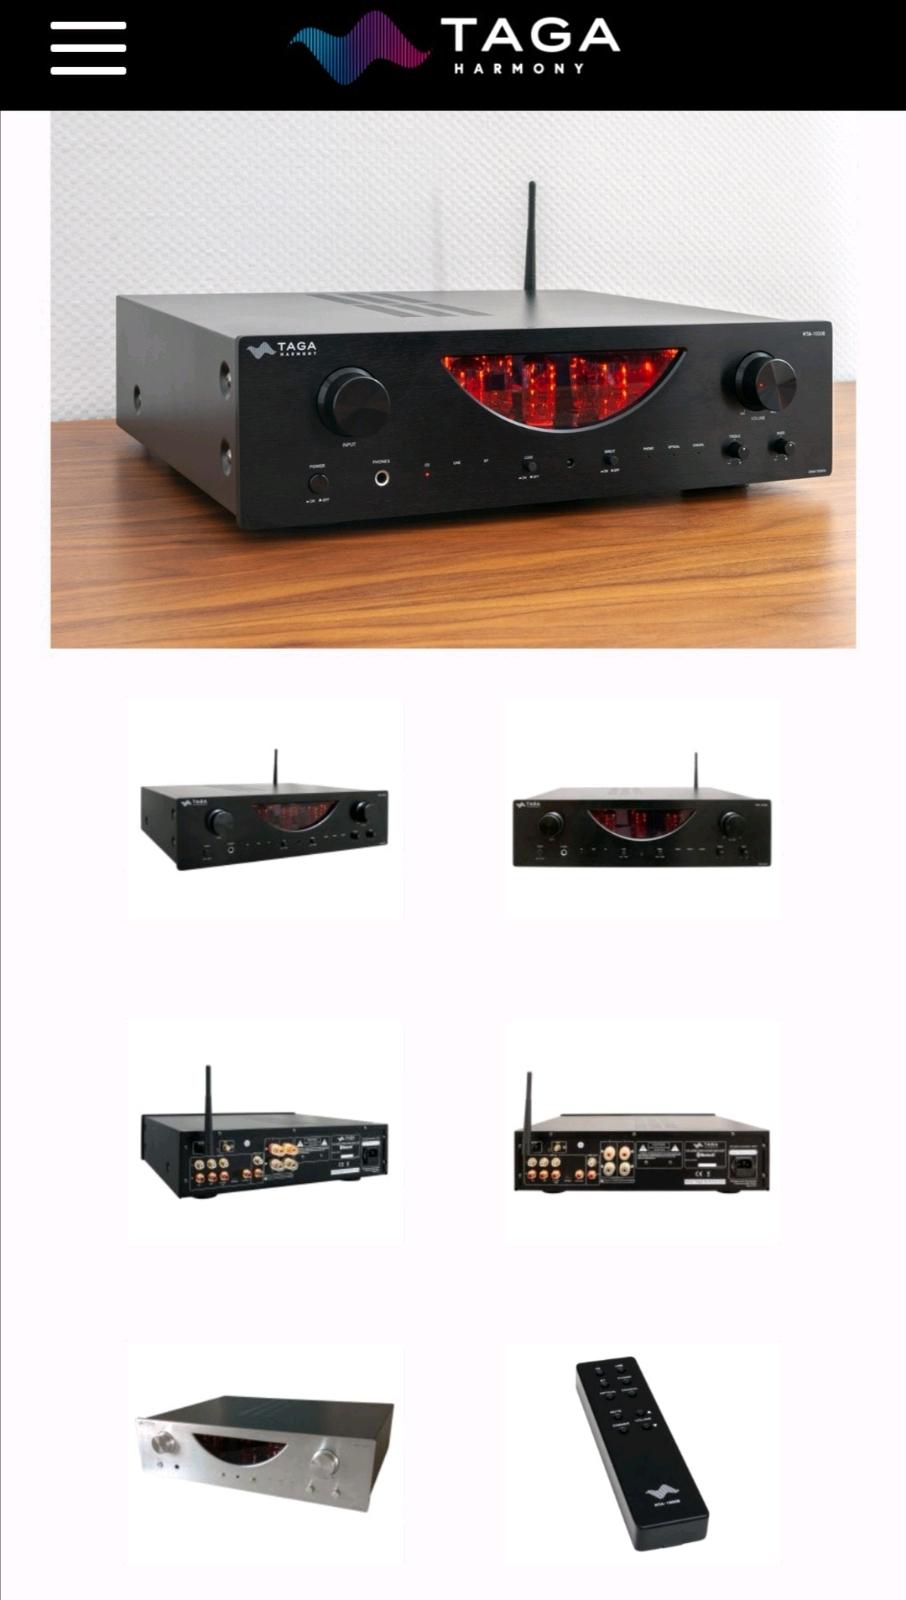 Taga hybrid stereo amplifier